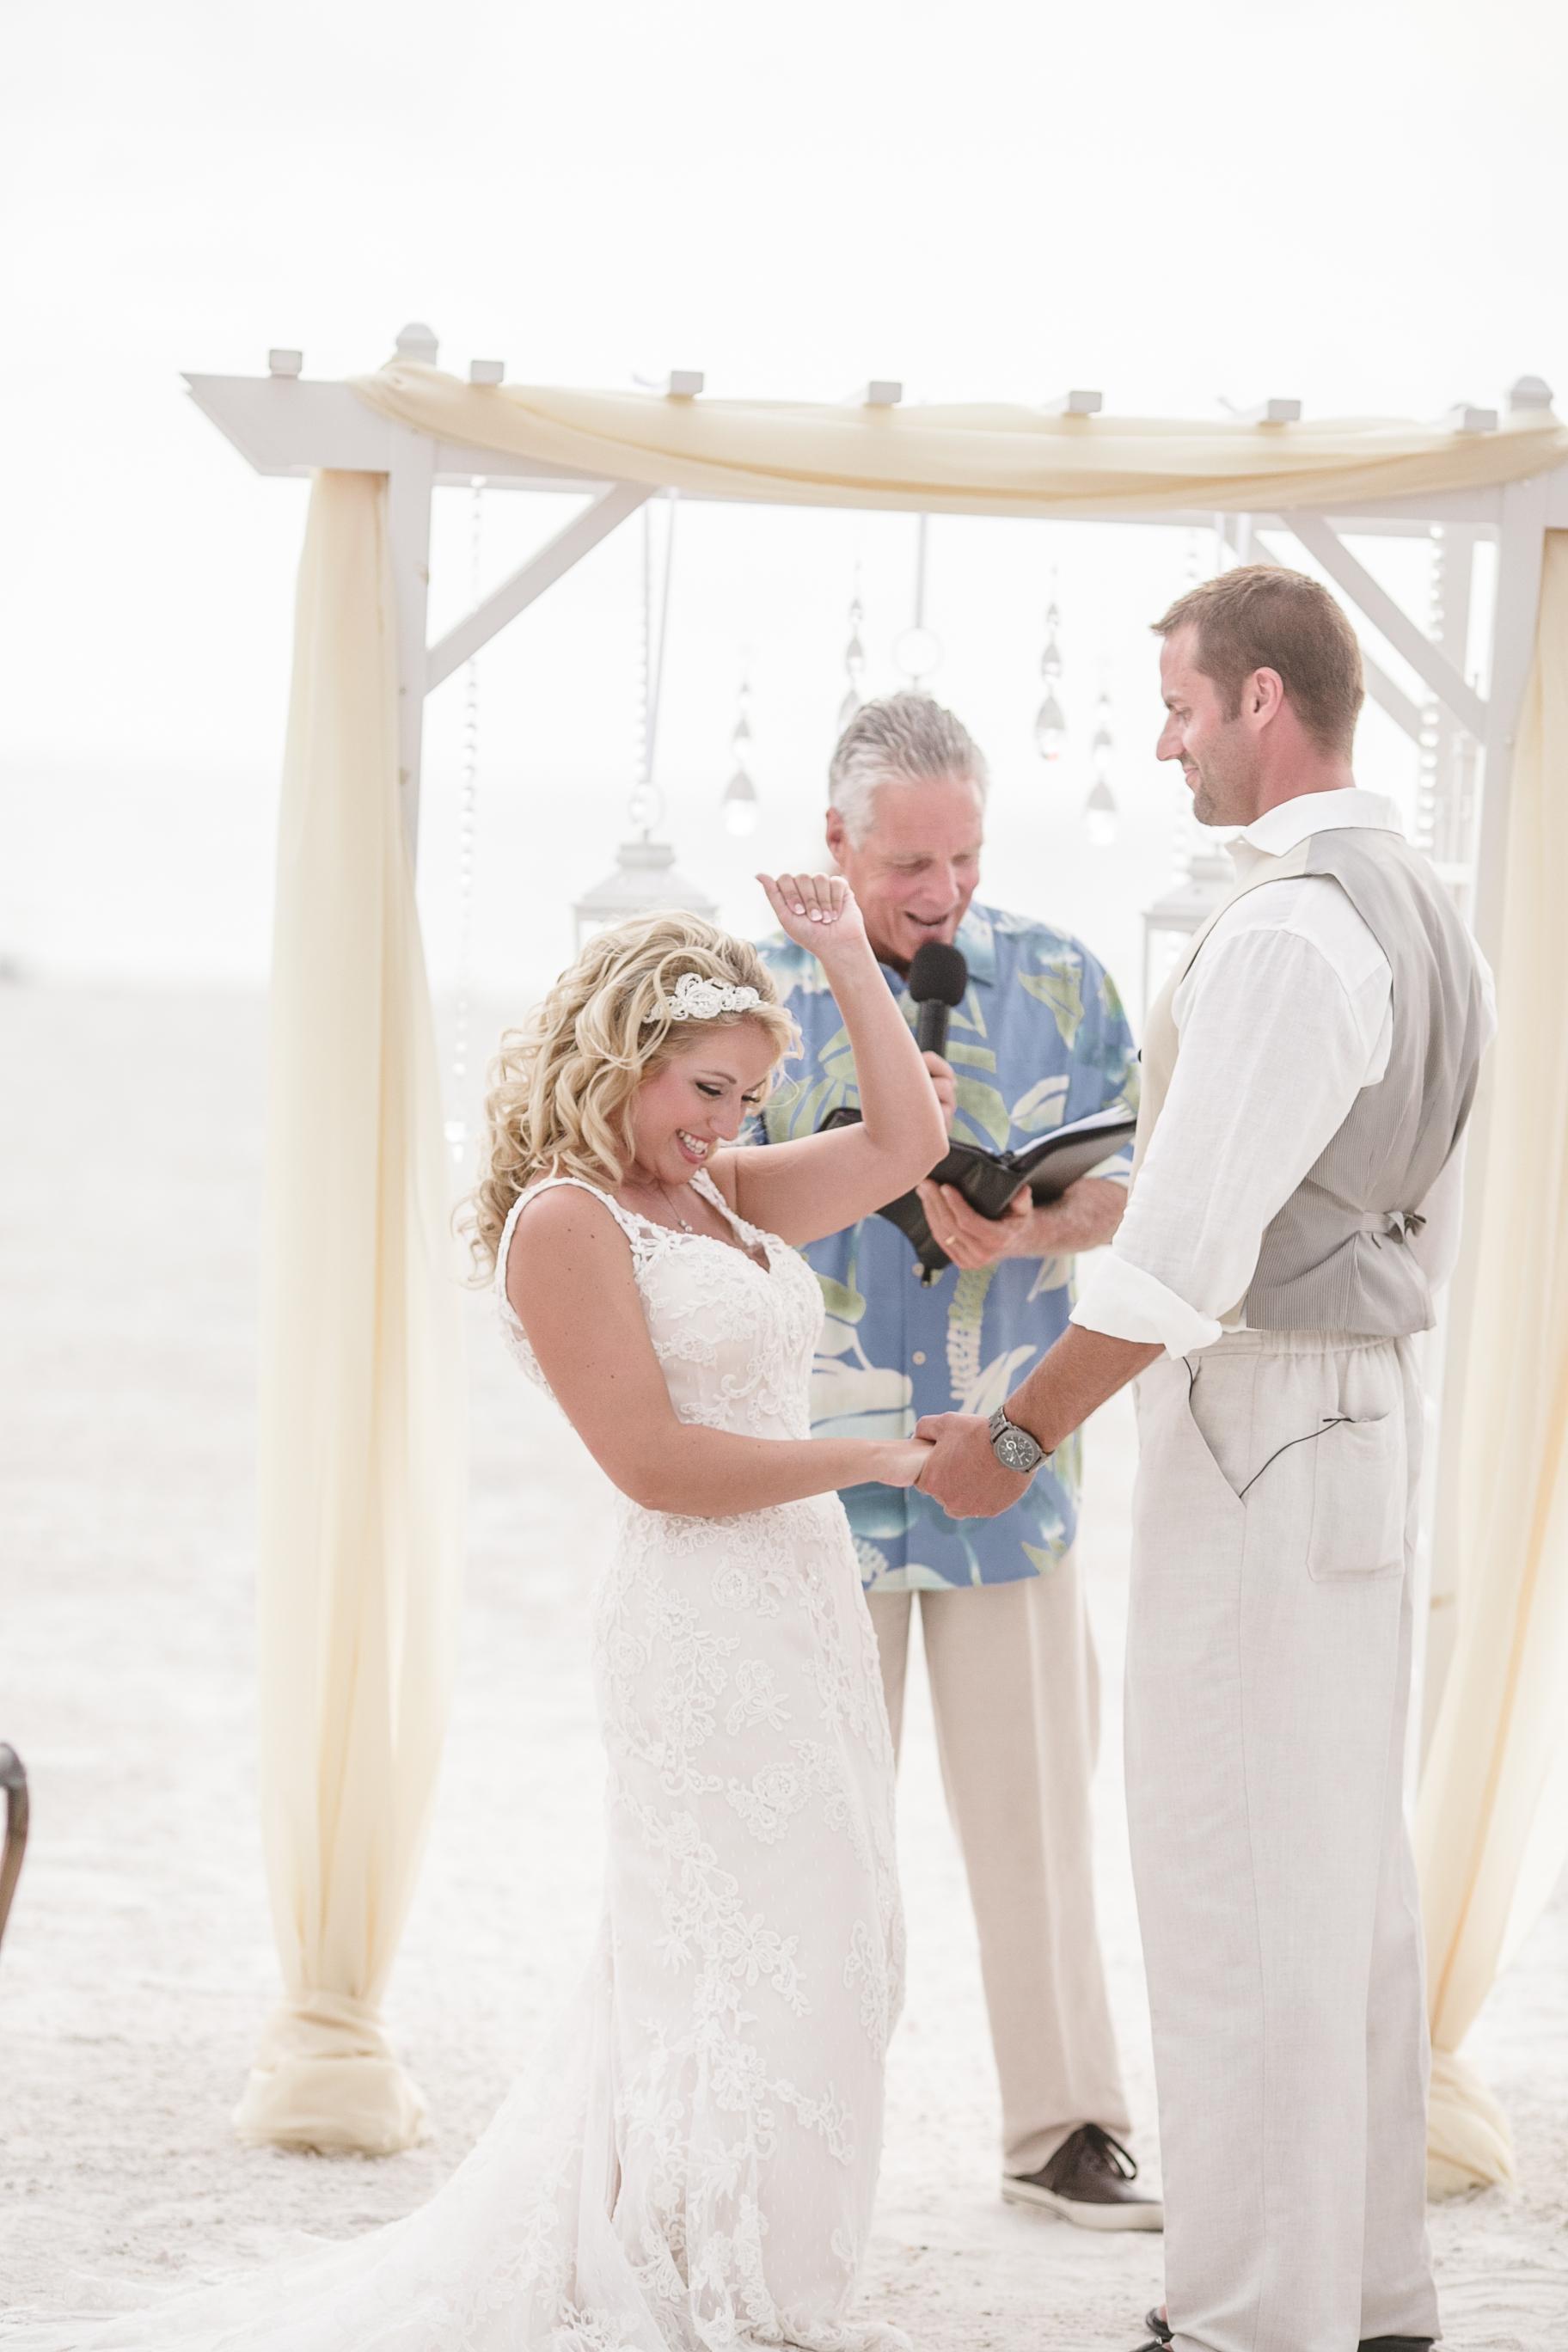 Harris wedding (43 of 72).JPG